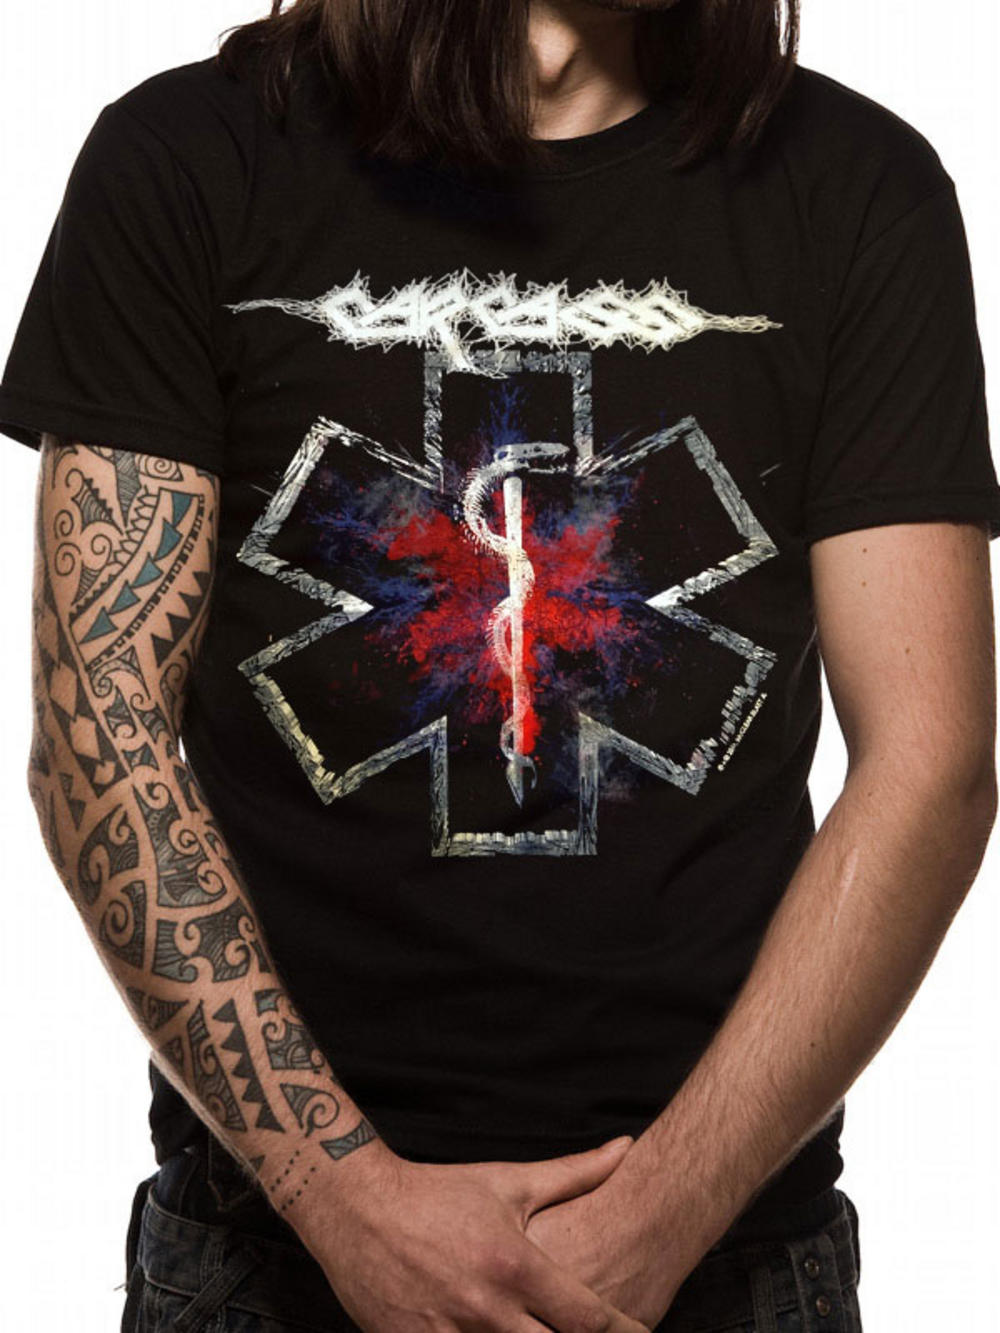 Carcass (Unfit For Human Consumption) T-shirt